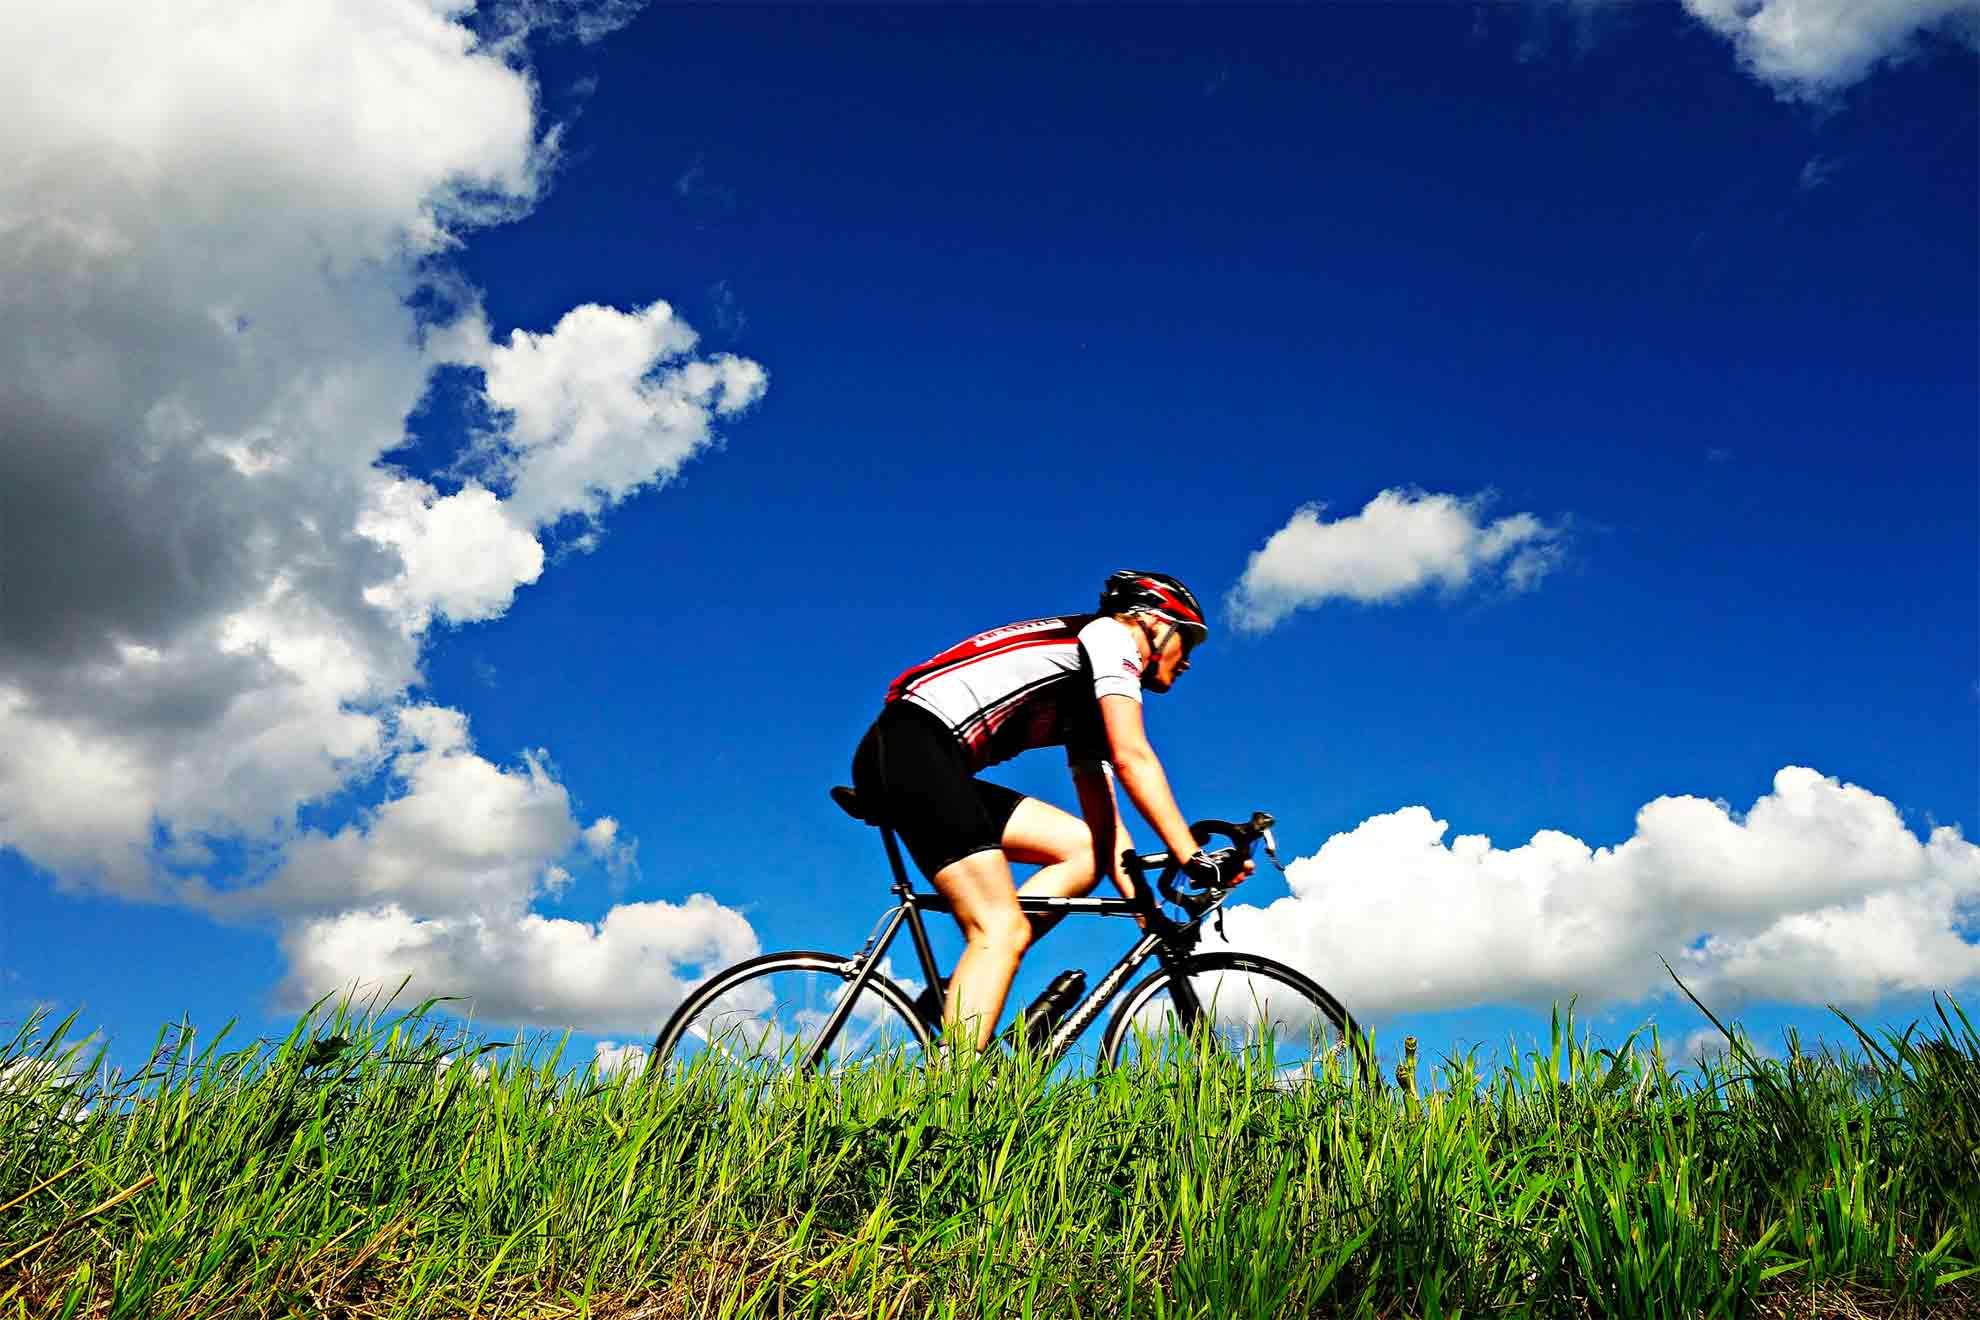 Calendario de marchas cicloturistas en España